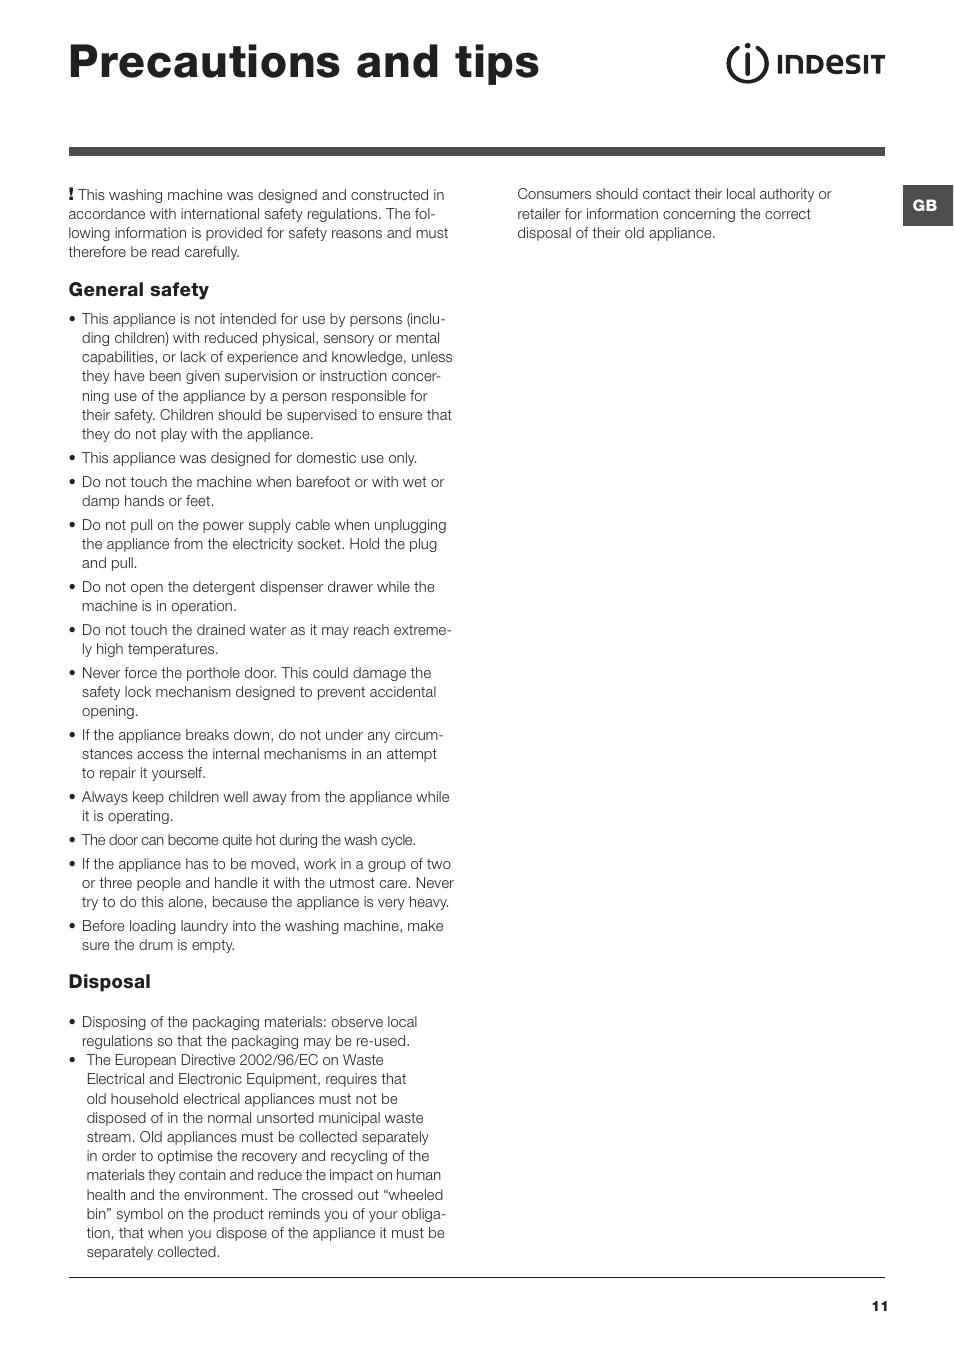 Indesit iwd61450 user manual   page 14 / 16.